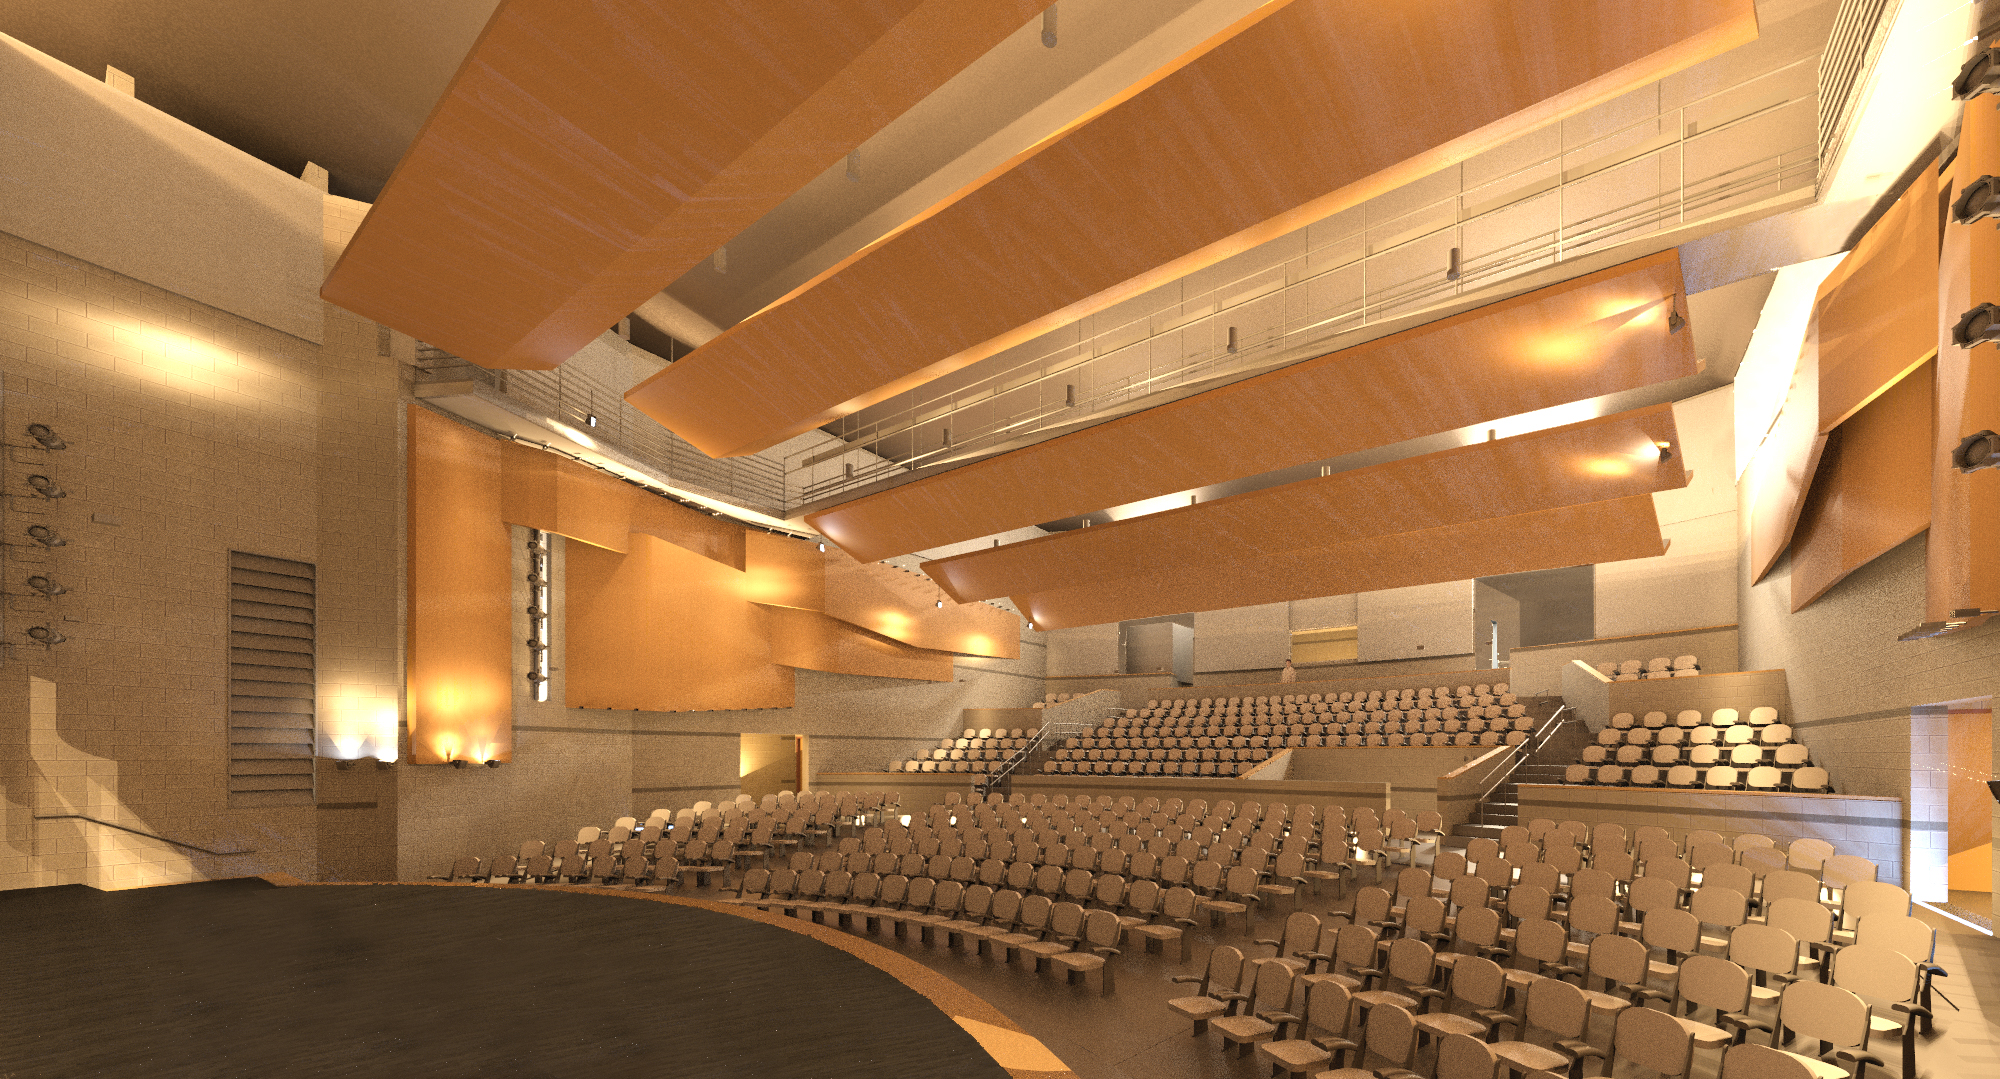 2120.00 - Regis Jesuit High School Performing Arts Center - 02.jpg